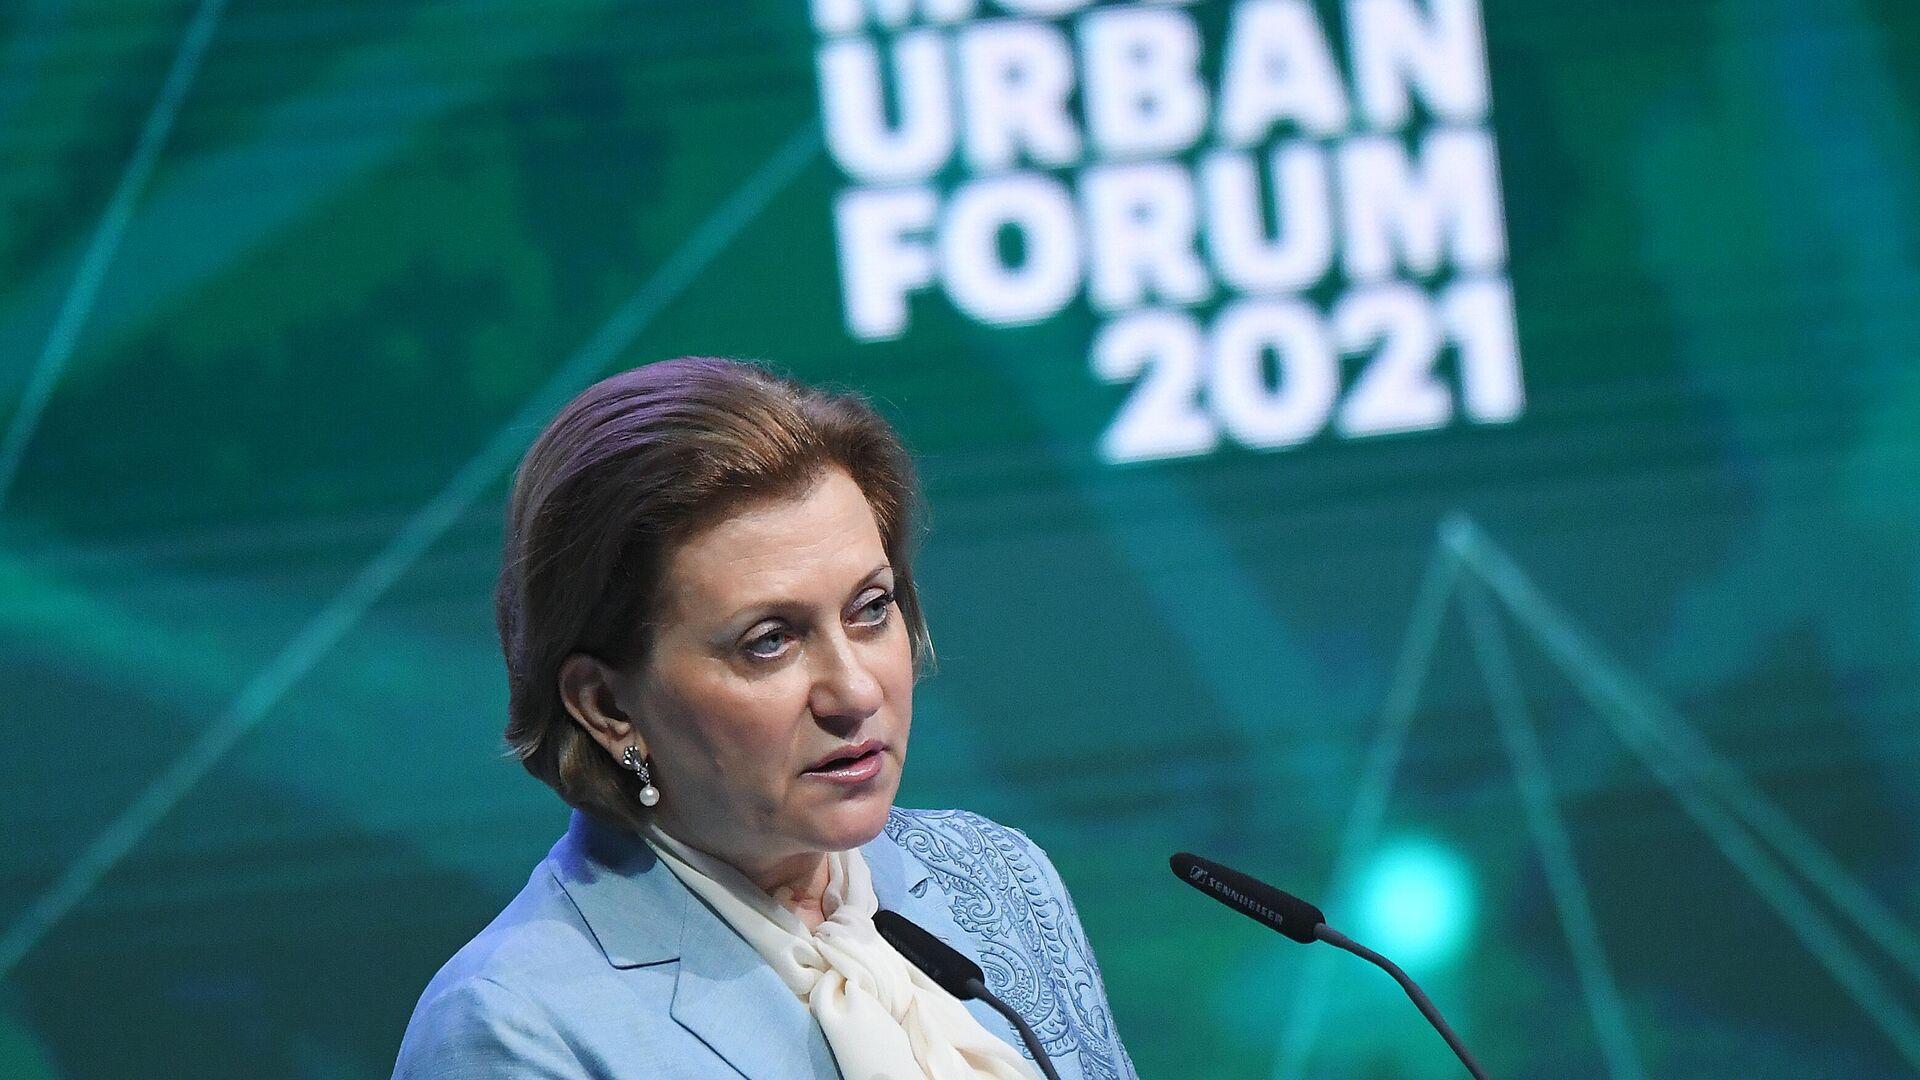 Анна Попова на форуме Moscow Urban Forum 2021 - РИА Новости, 1920, 09.07.2021